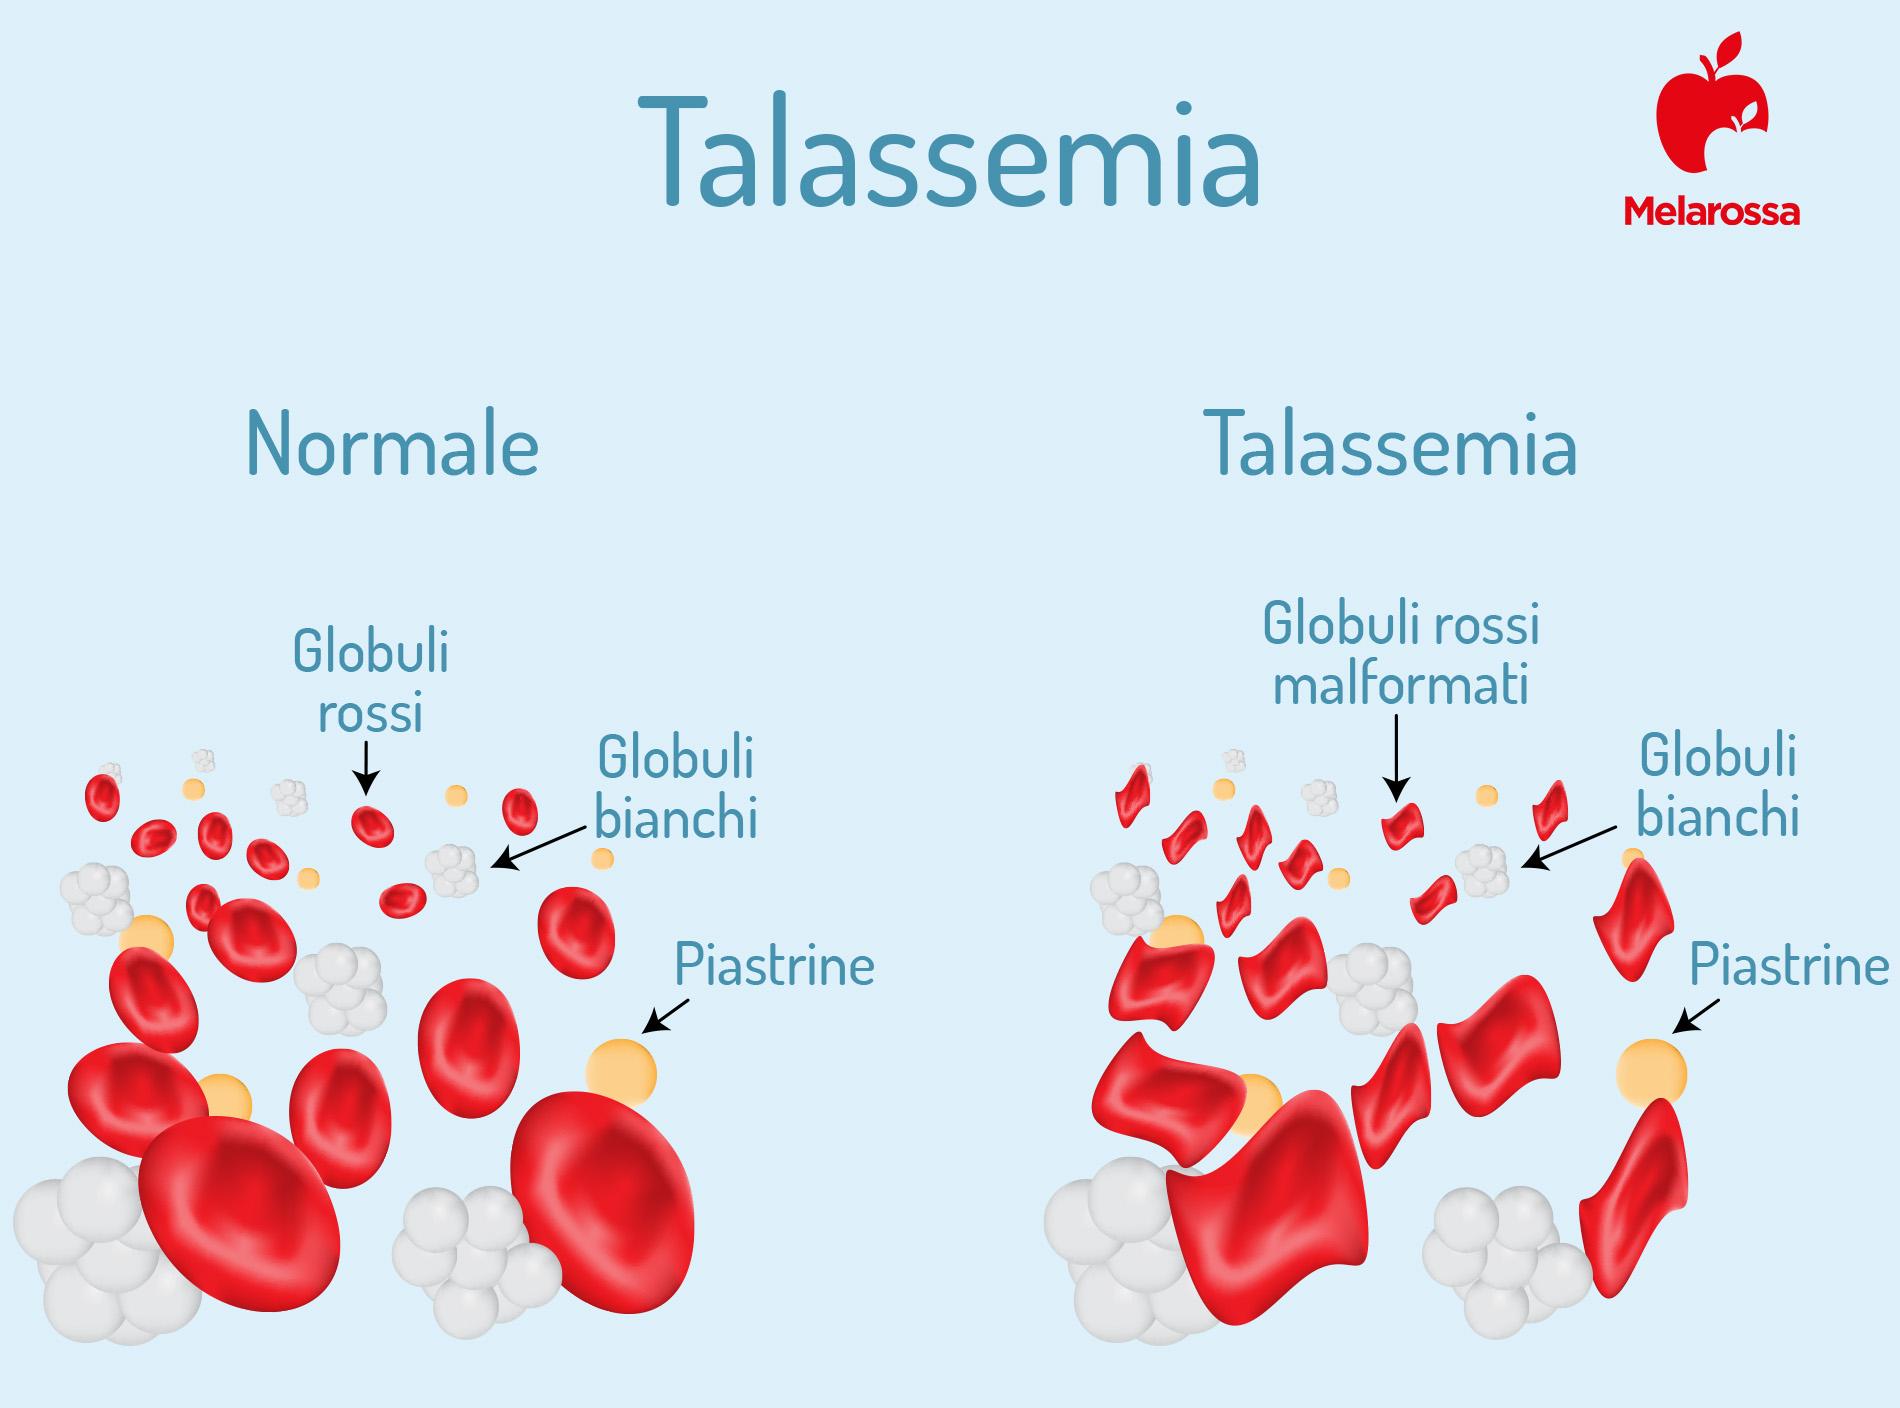 anemia mediterranea: globuli rossi